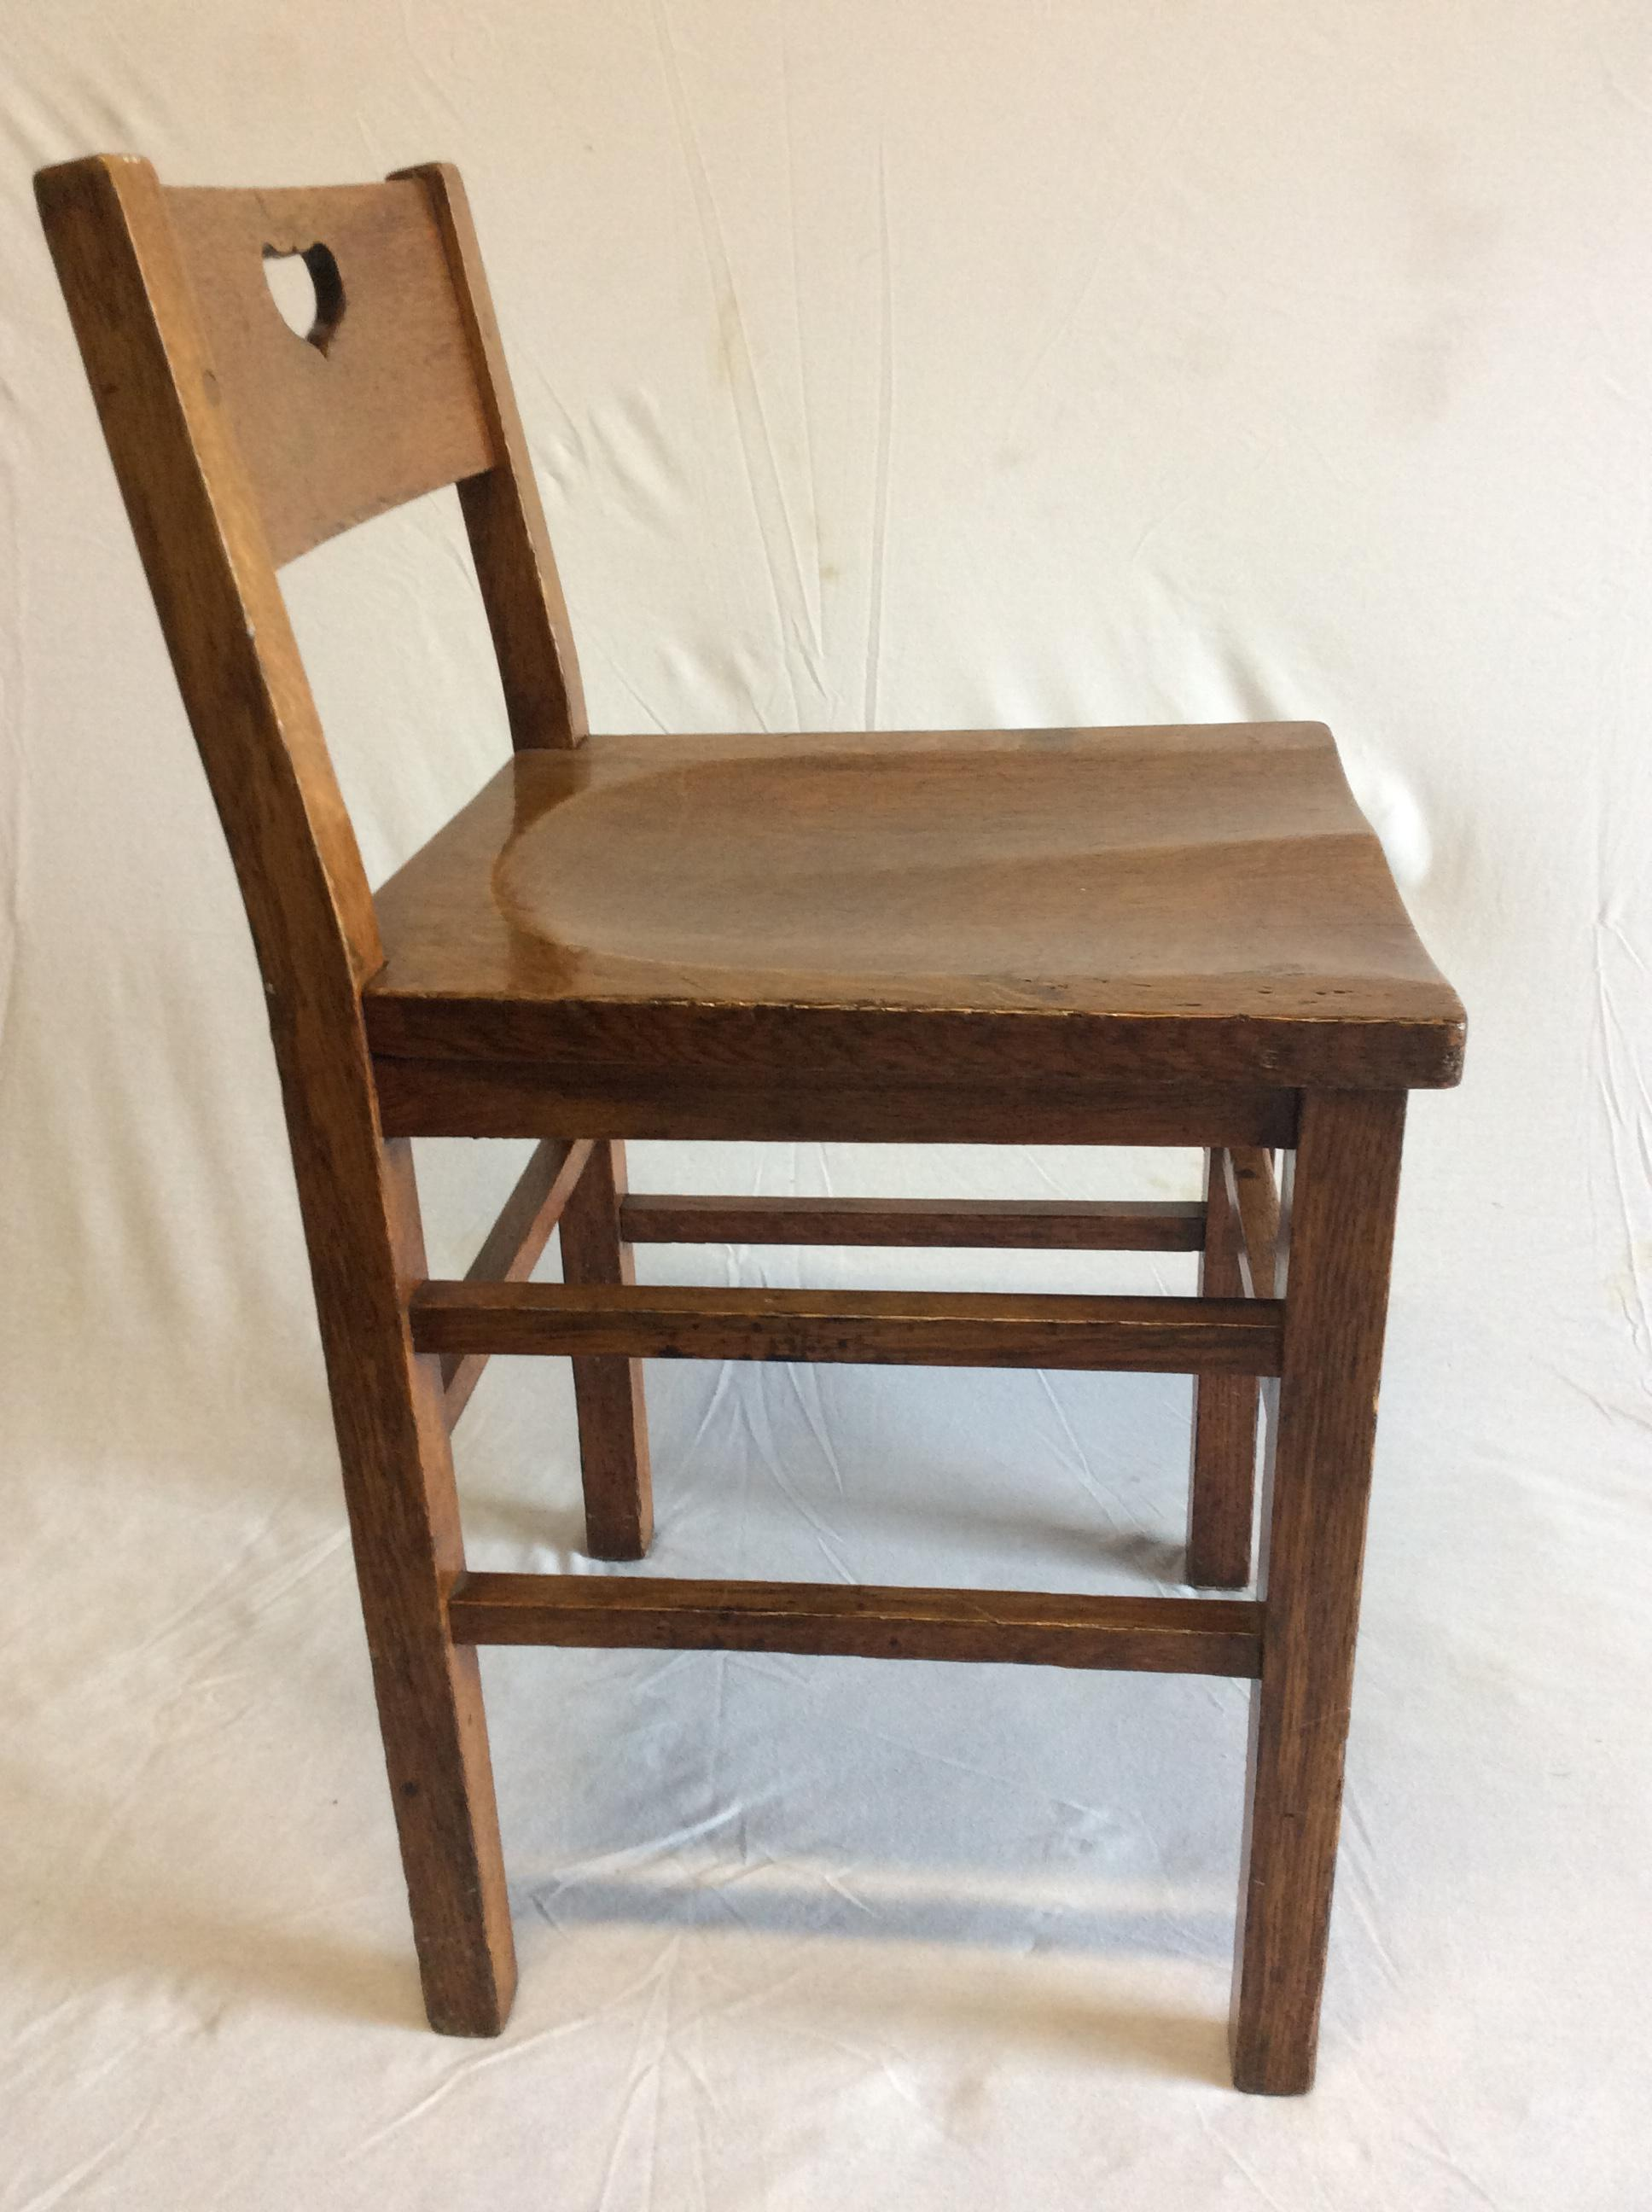 breakfast set furniture. stickley brothers furniture breakfast set image 8 of 11 r